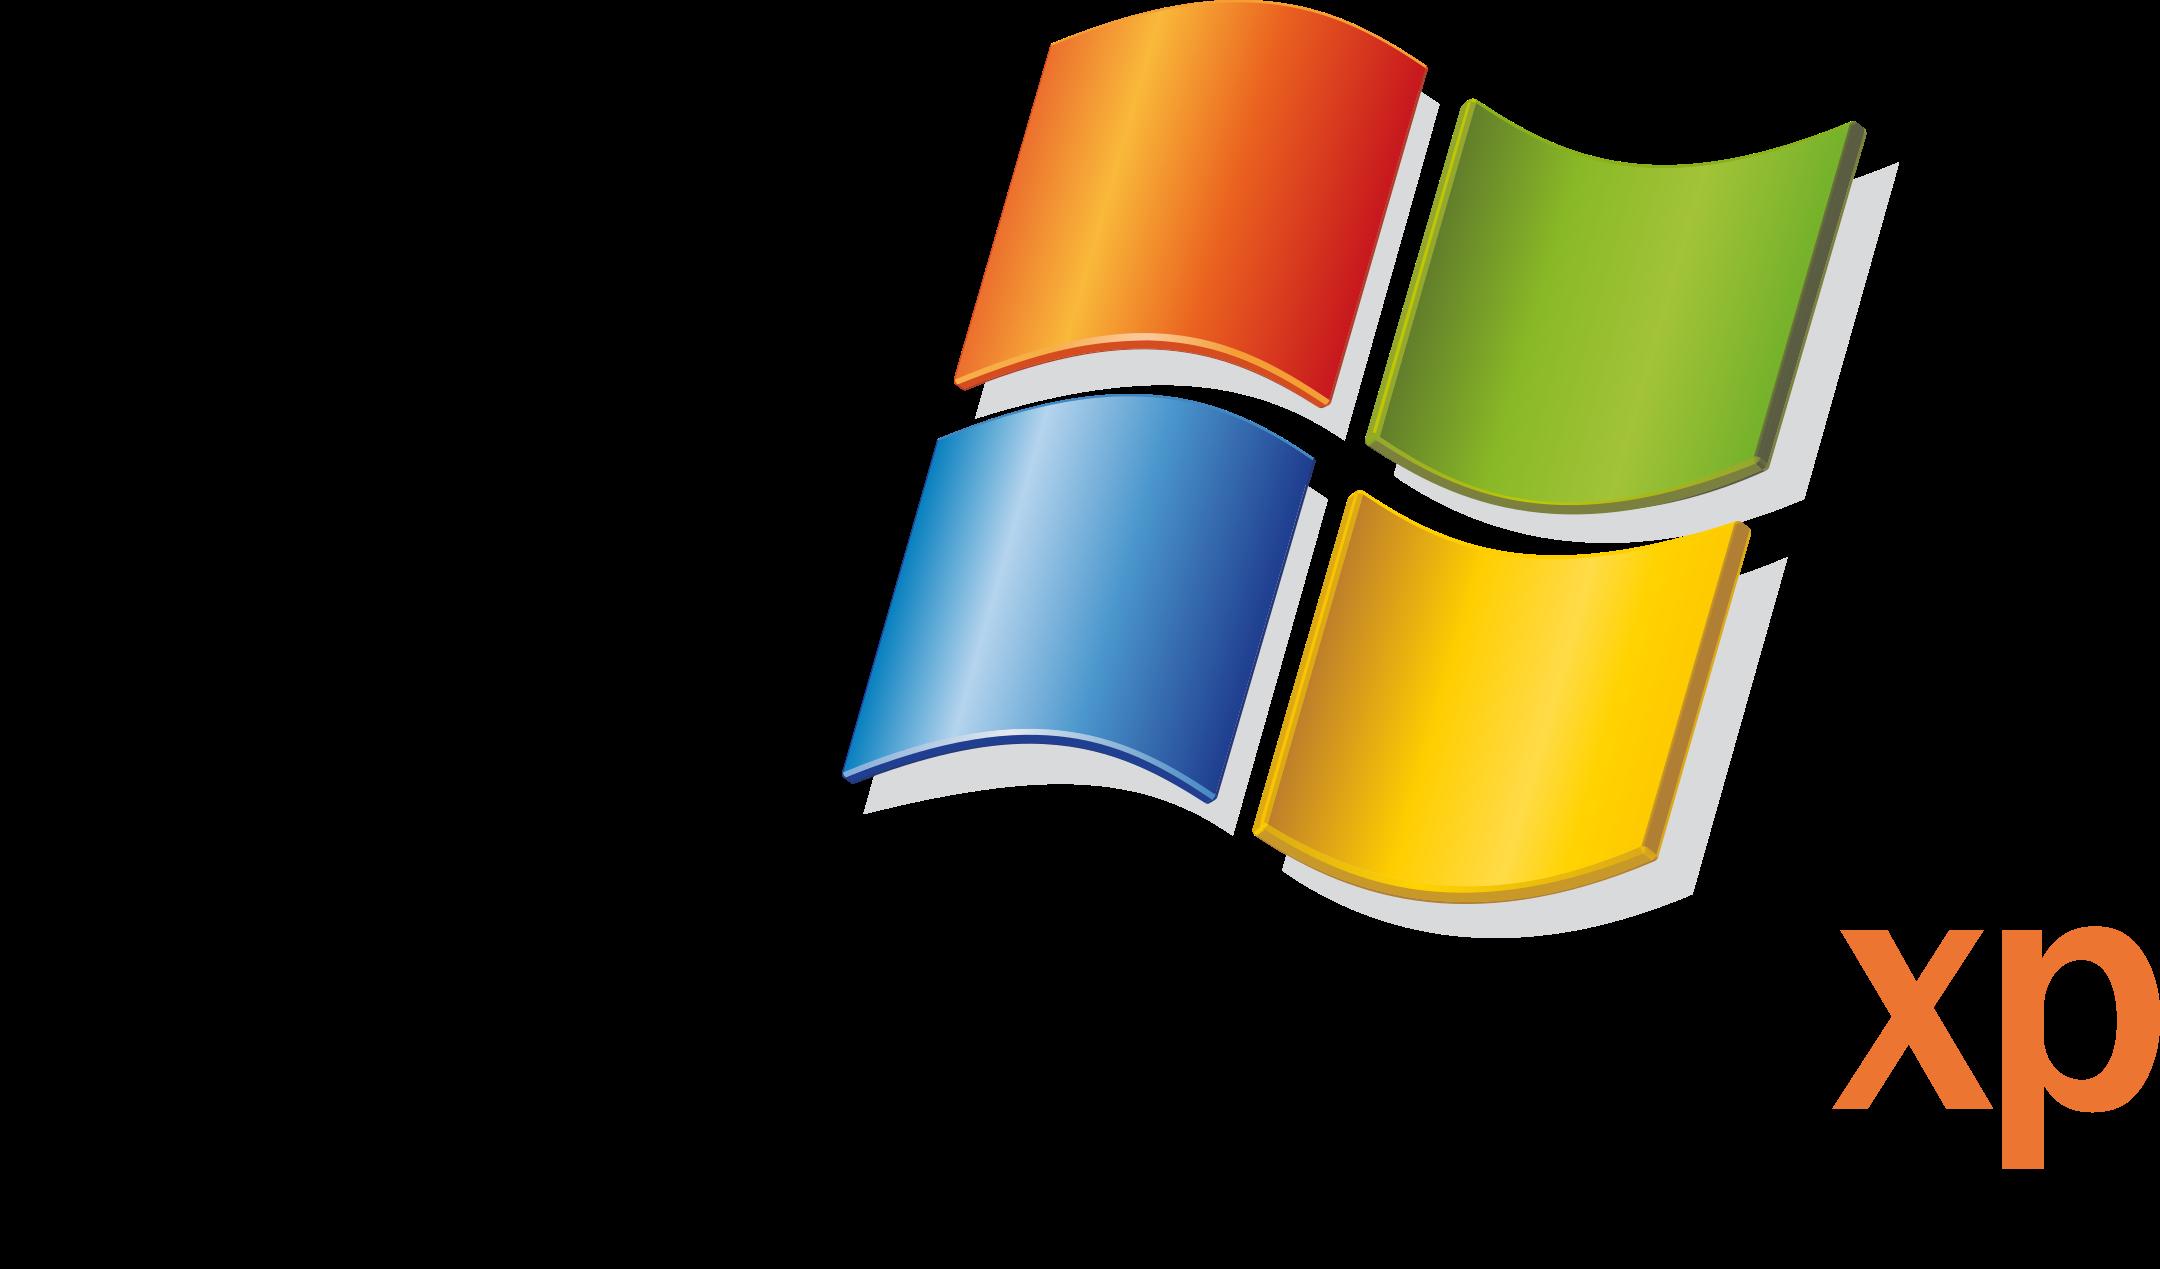 windows xp logo 1 - Windows XP Logo